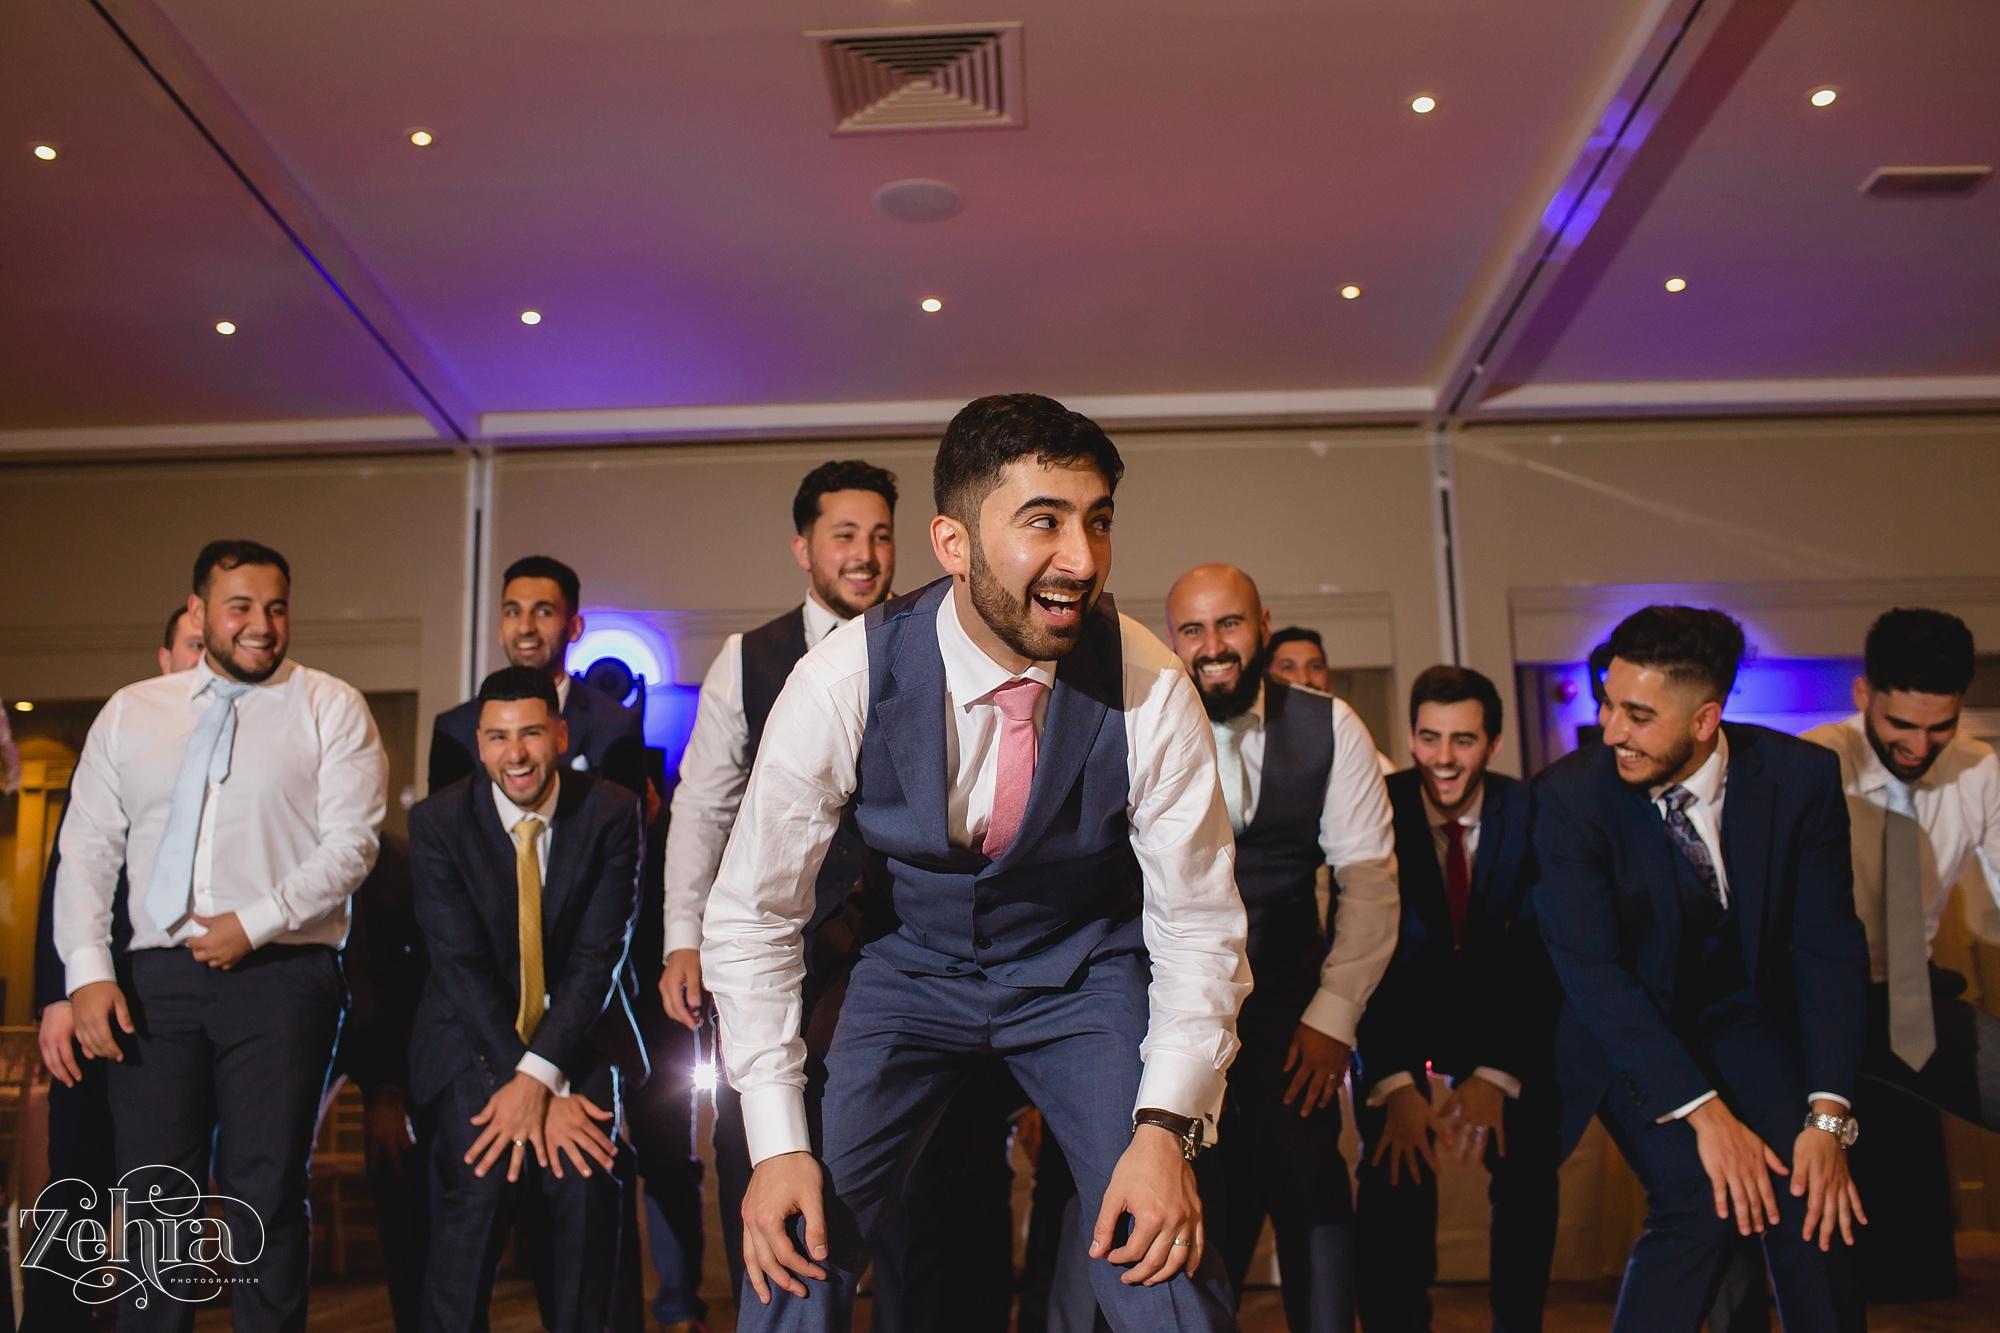 zehra photographer mere cheshire wedding_0061.jpg